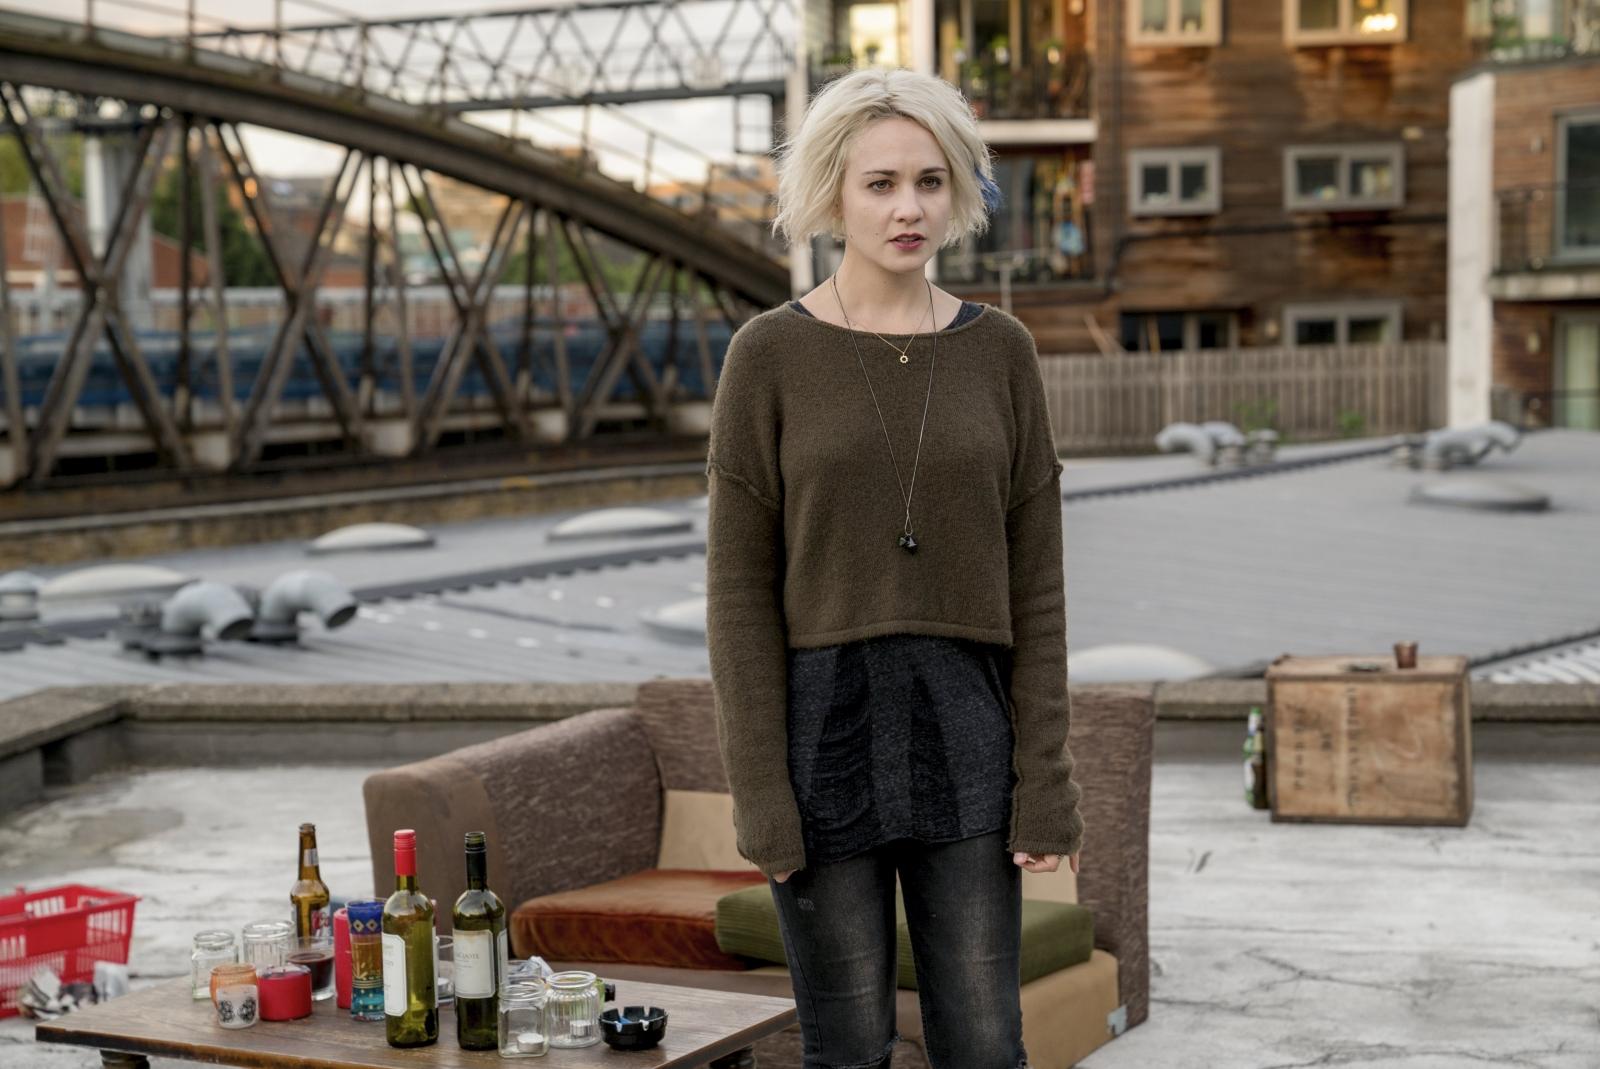 Riley in Sense8 season 2